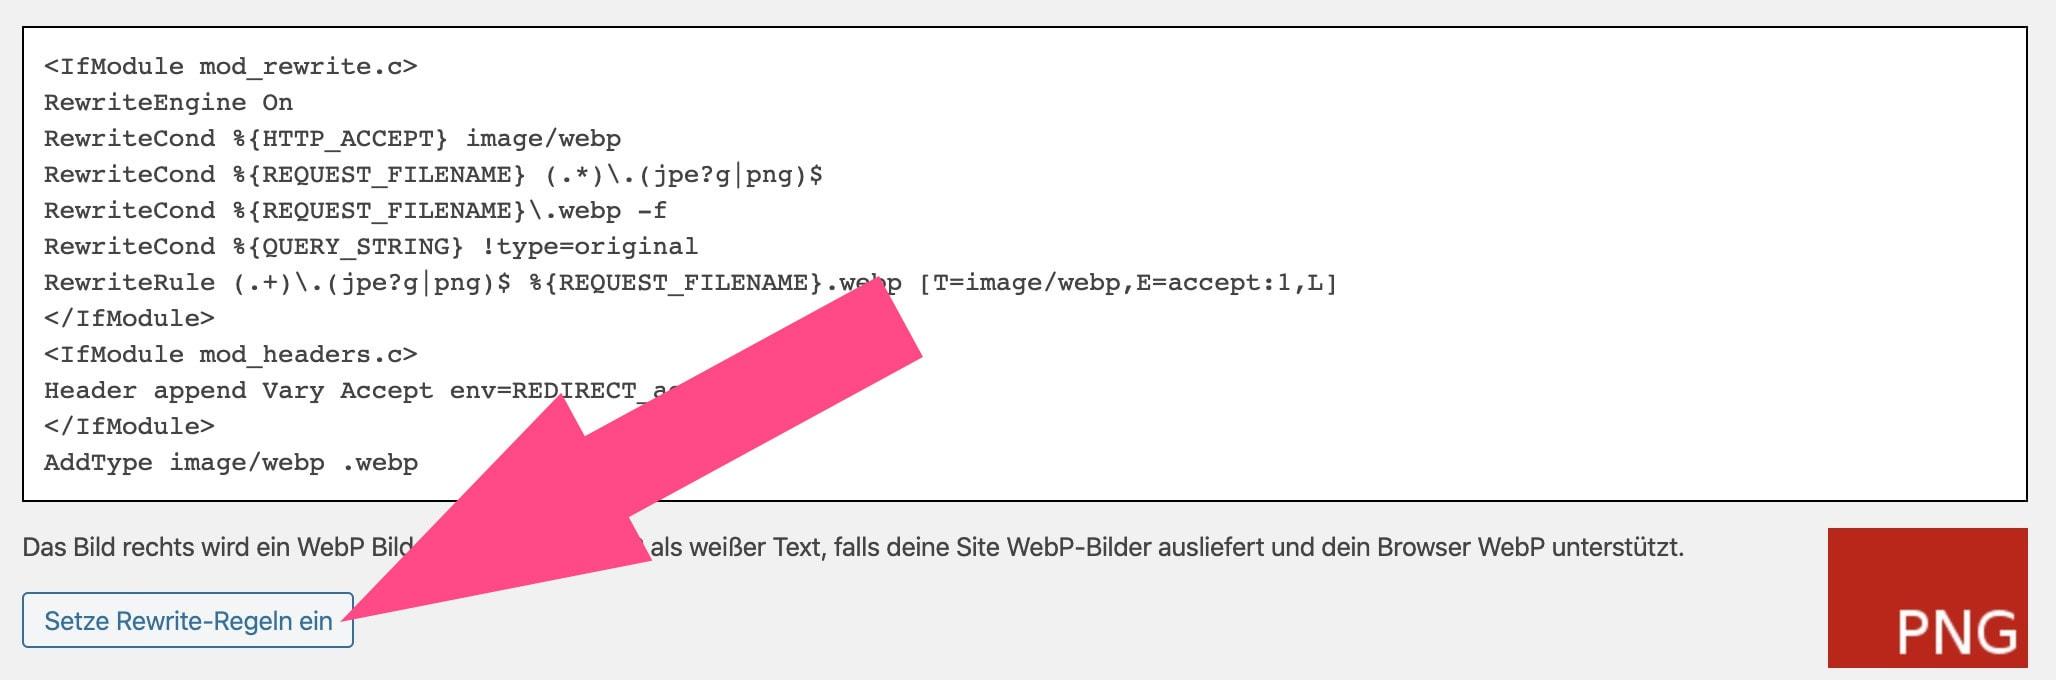 WebP rewrite Regeln